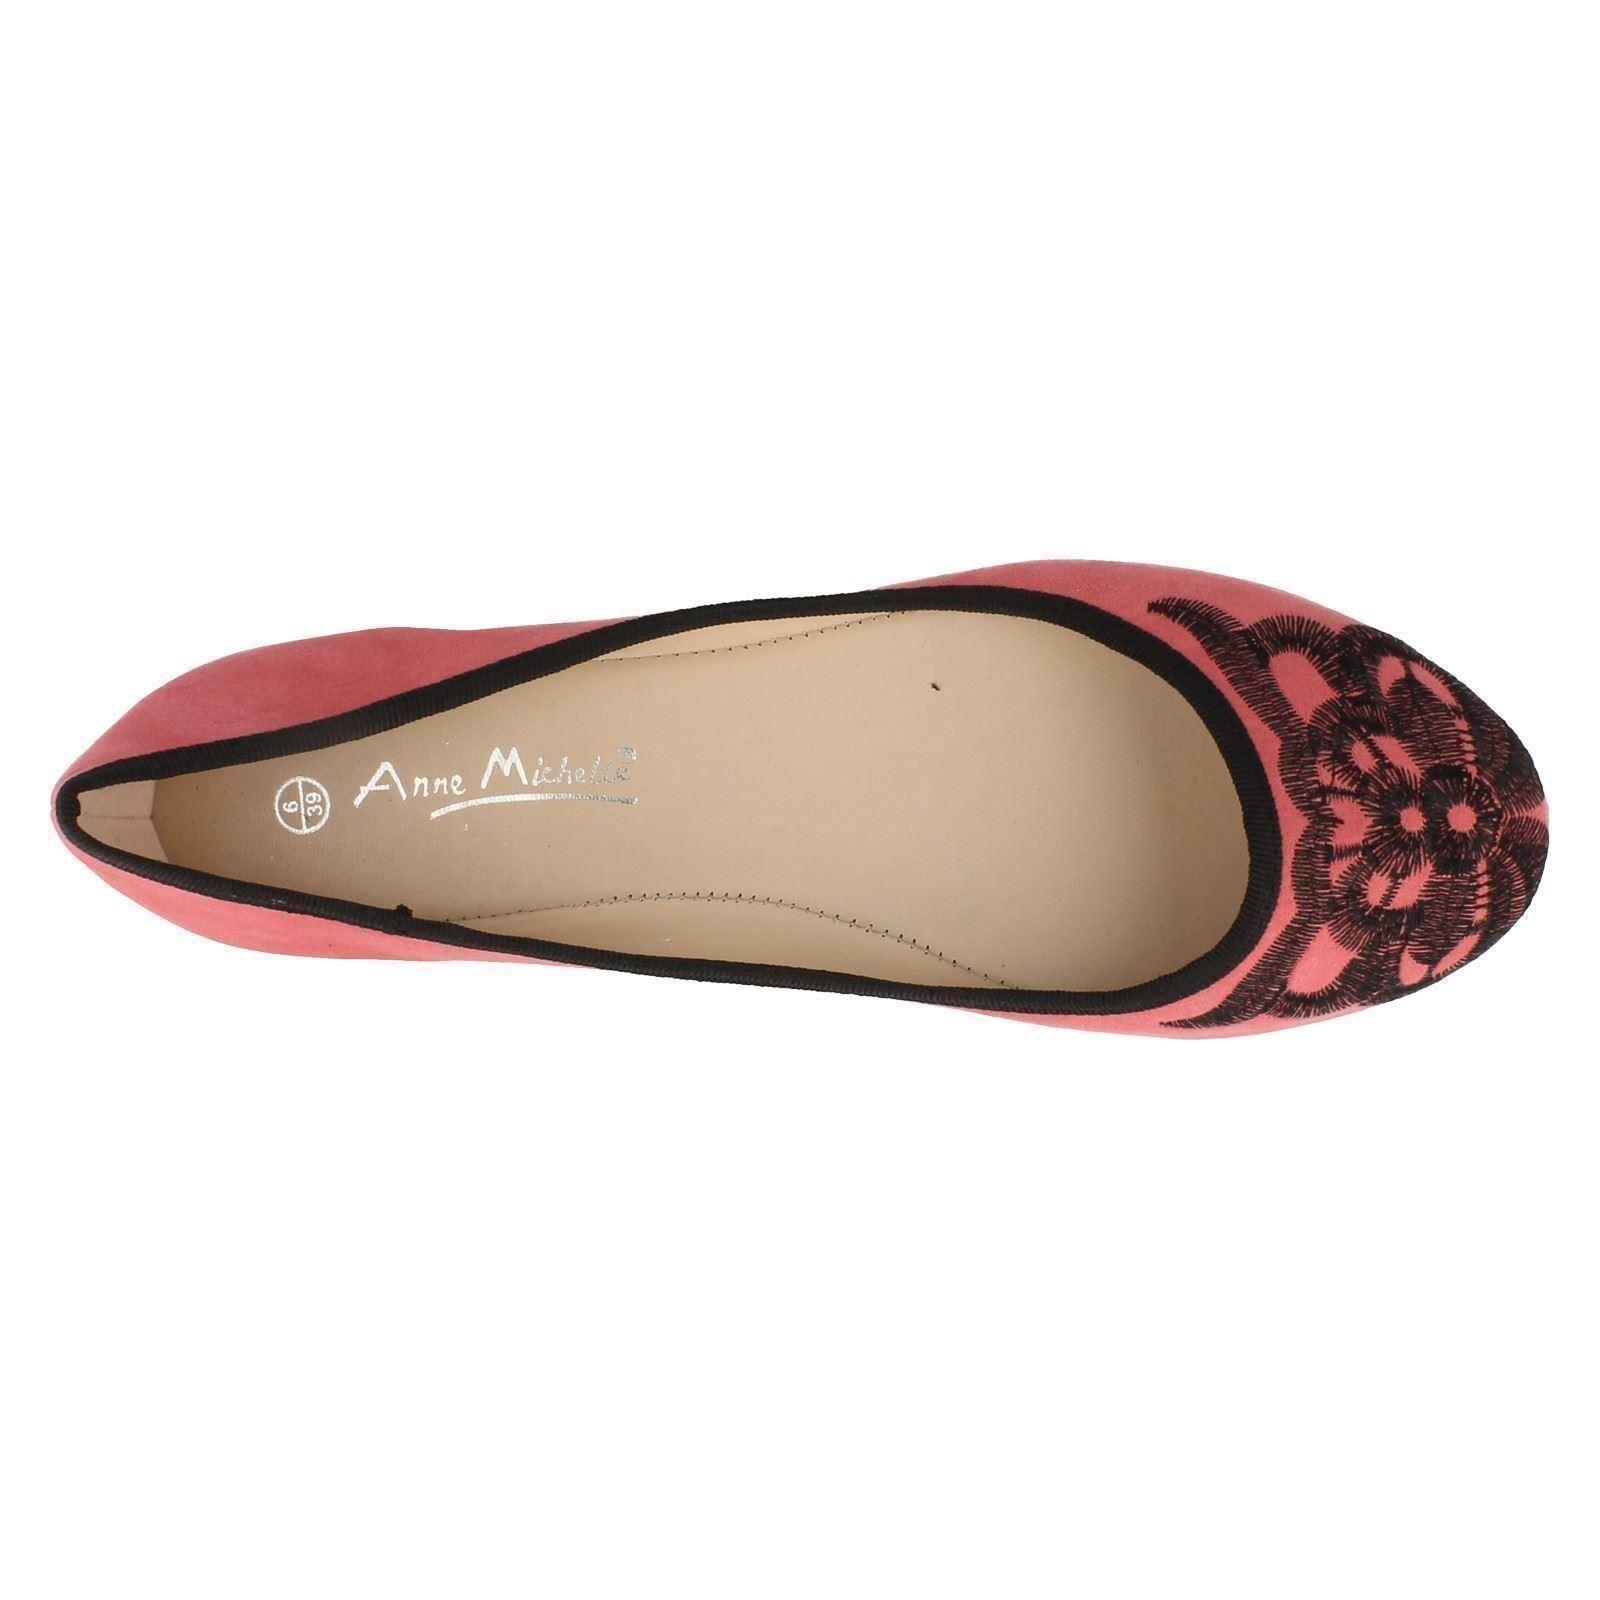 Señoras Anne Michelle Ballerina Pisos « estilo » L4946 £ 9.99